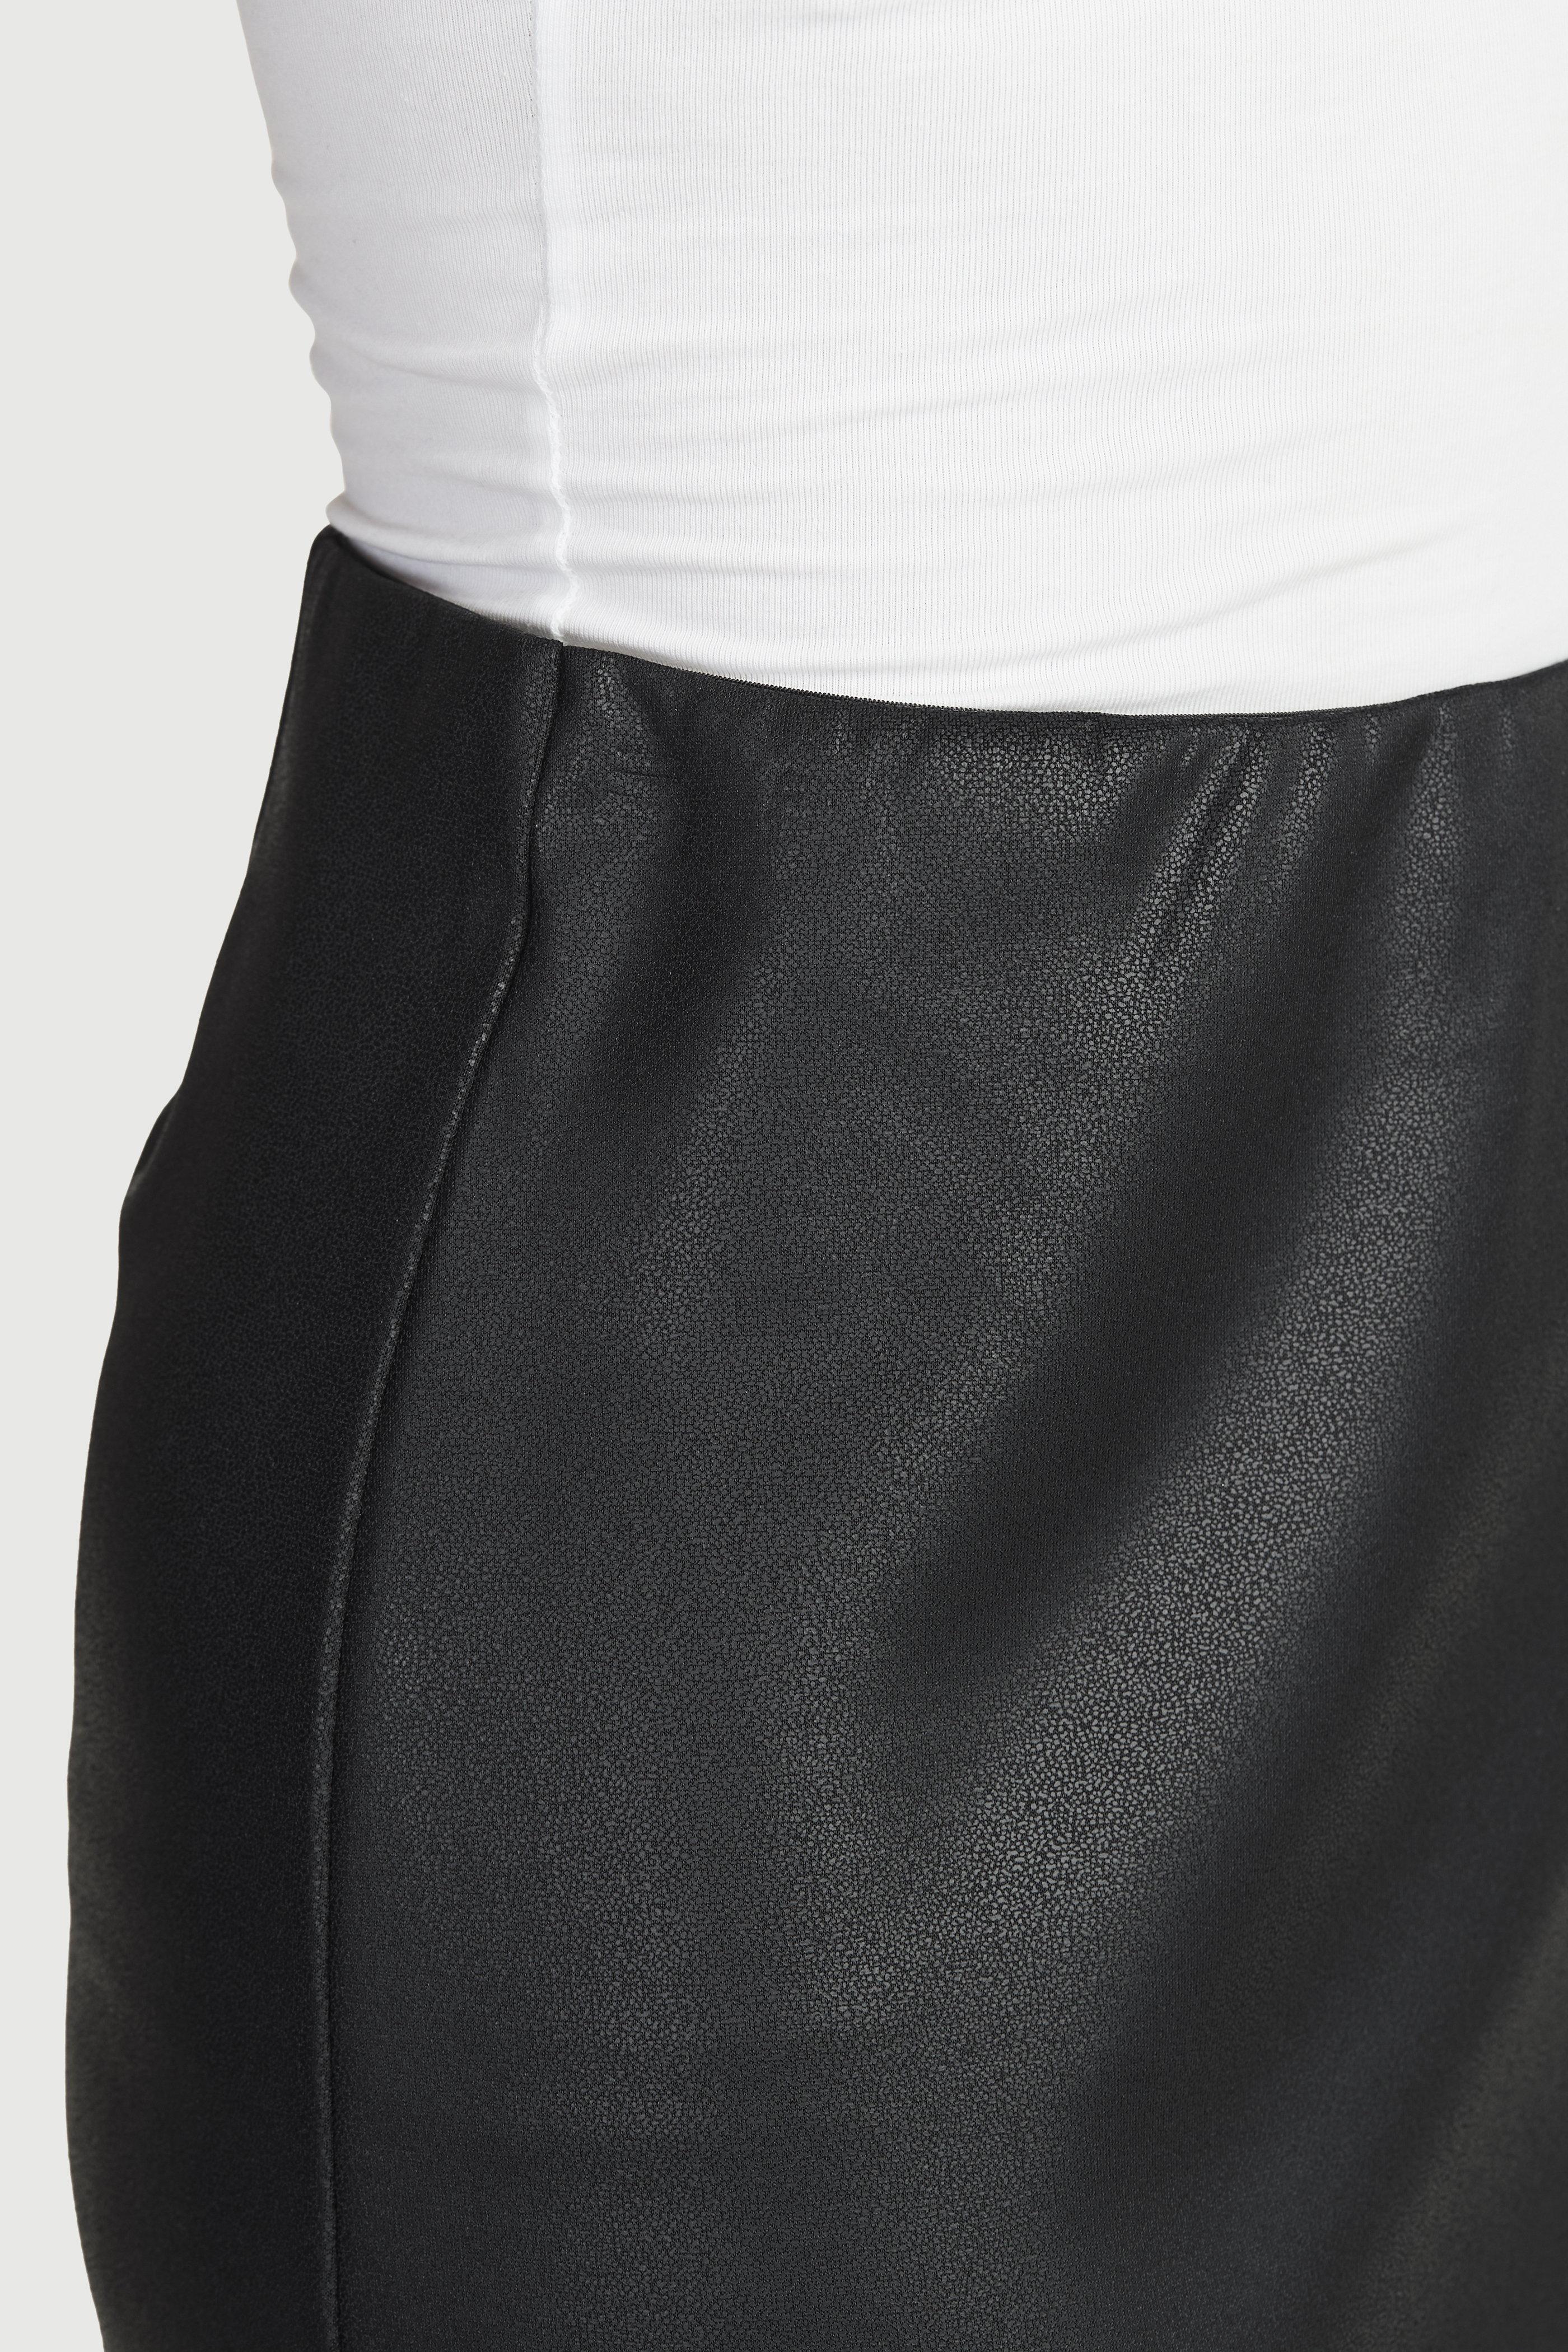 Krótka spódnica z PU ze stretchem